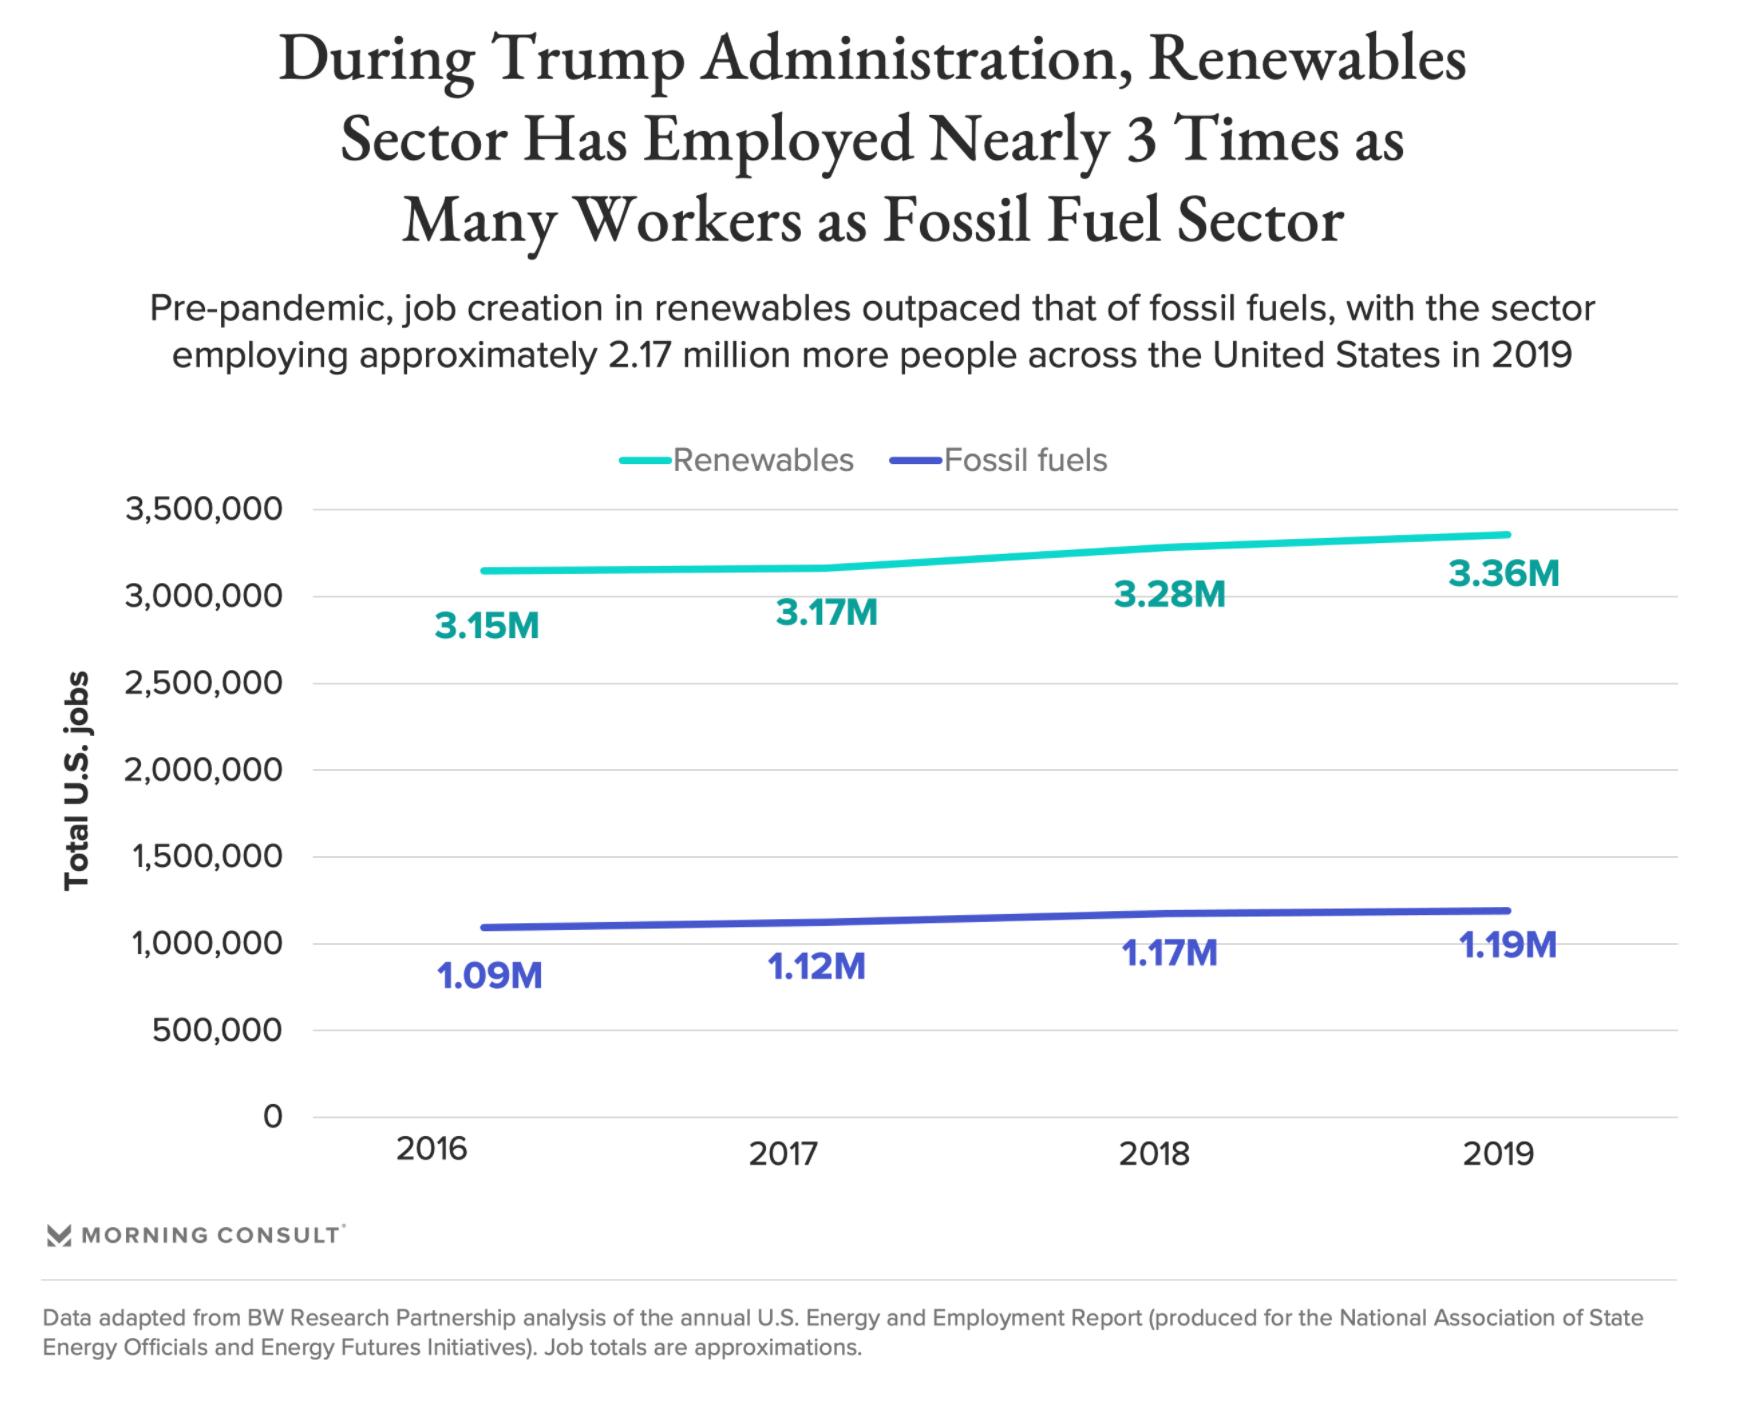 graph of renewables jobs